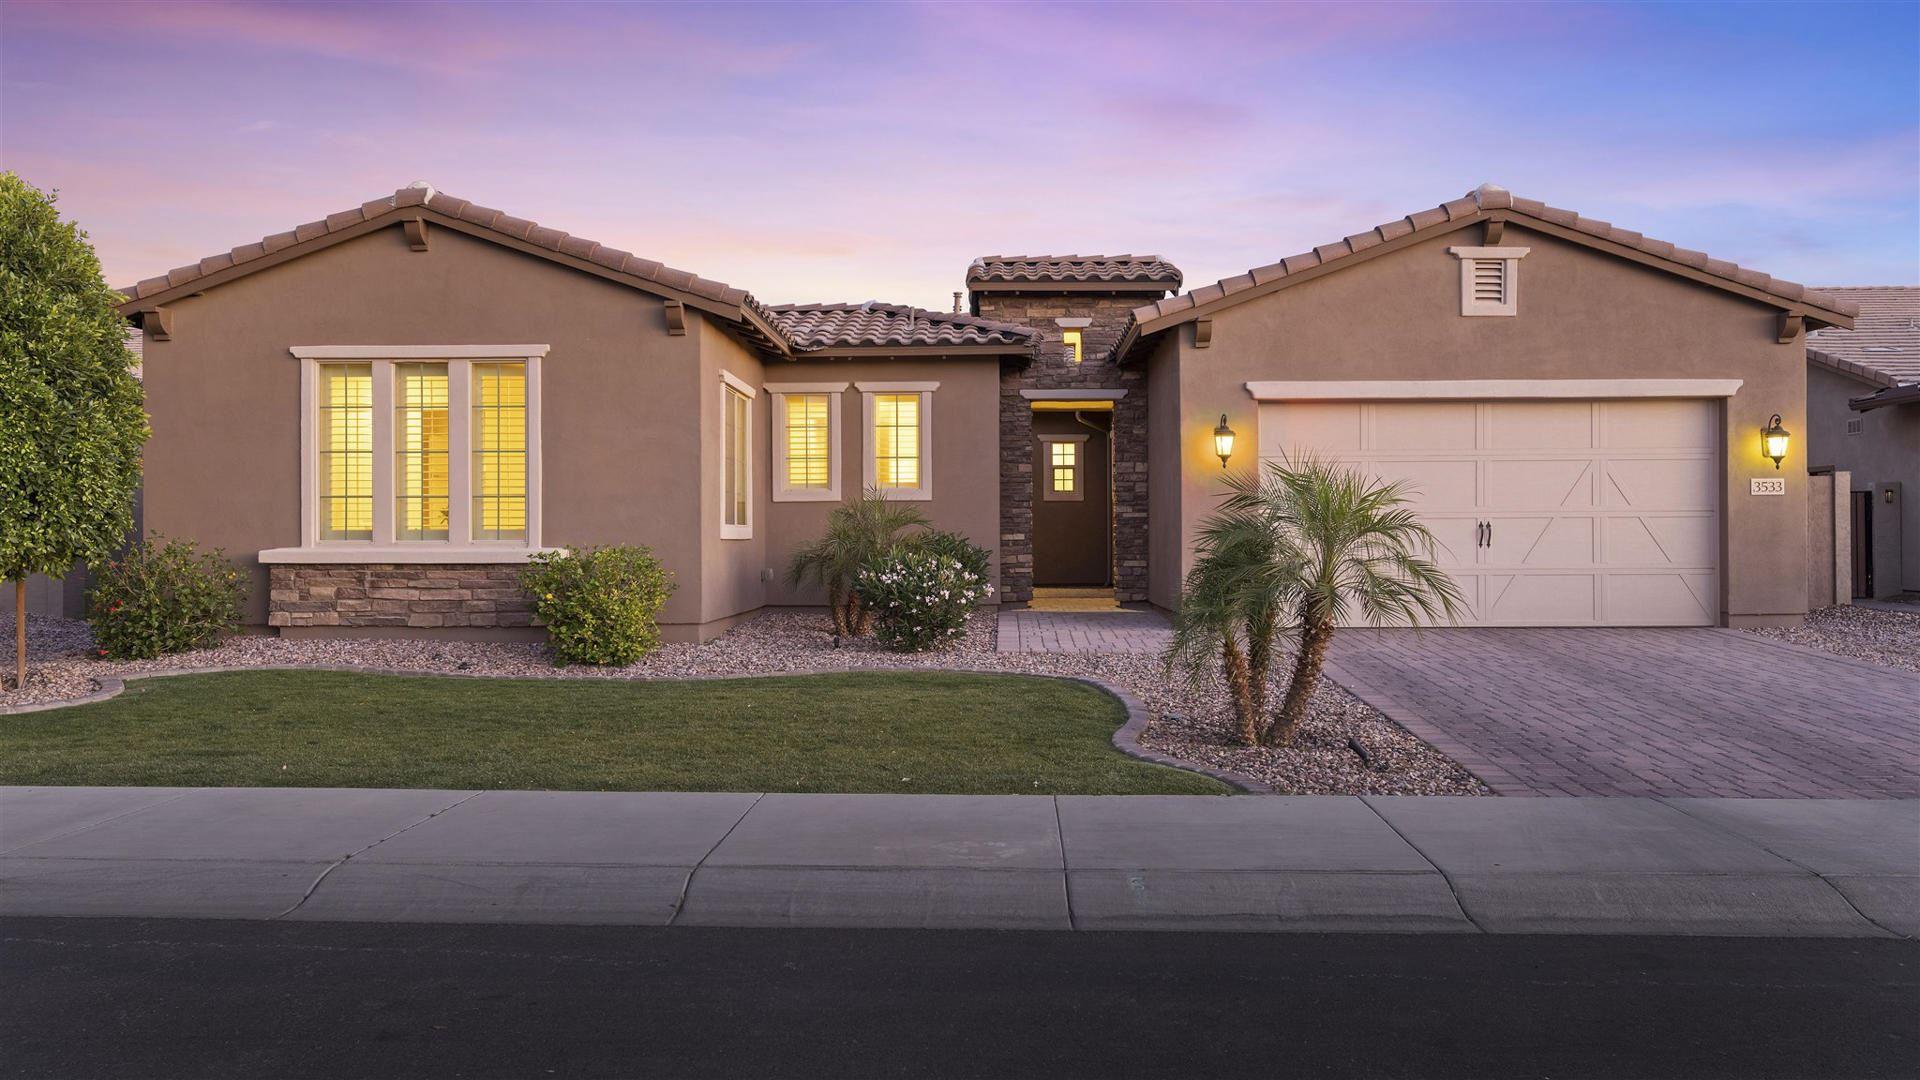 Photo of 3533 E PENEDES Drive, Gilbert, AZ 85298 (MLS # 6231777)